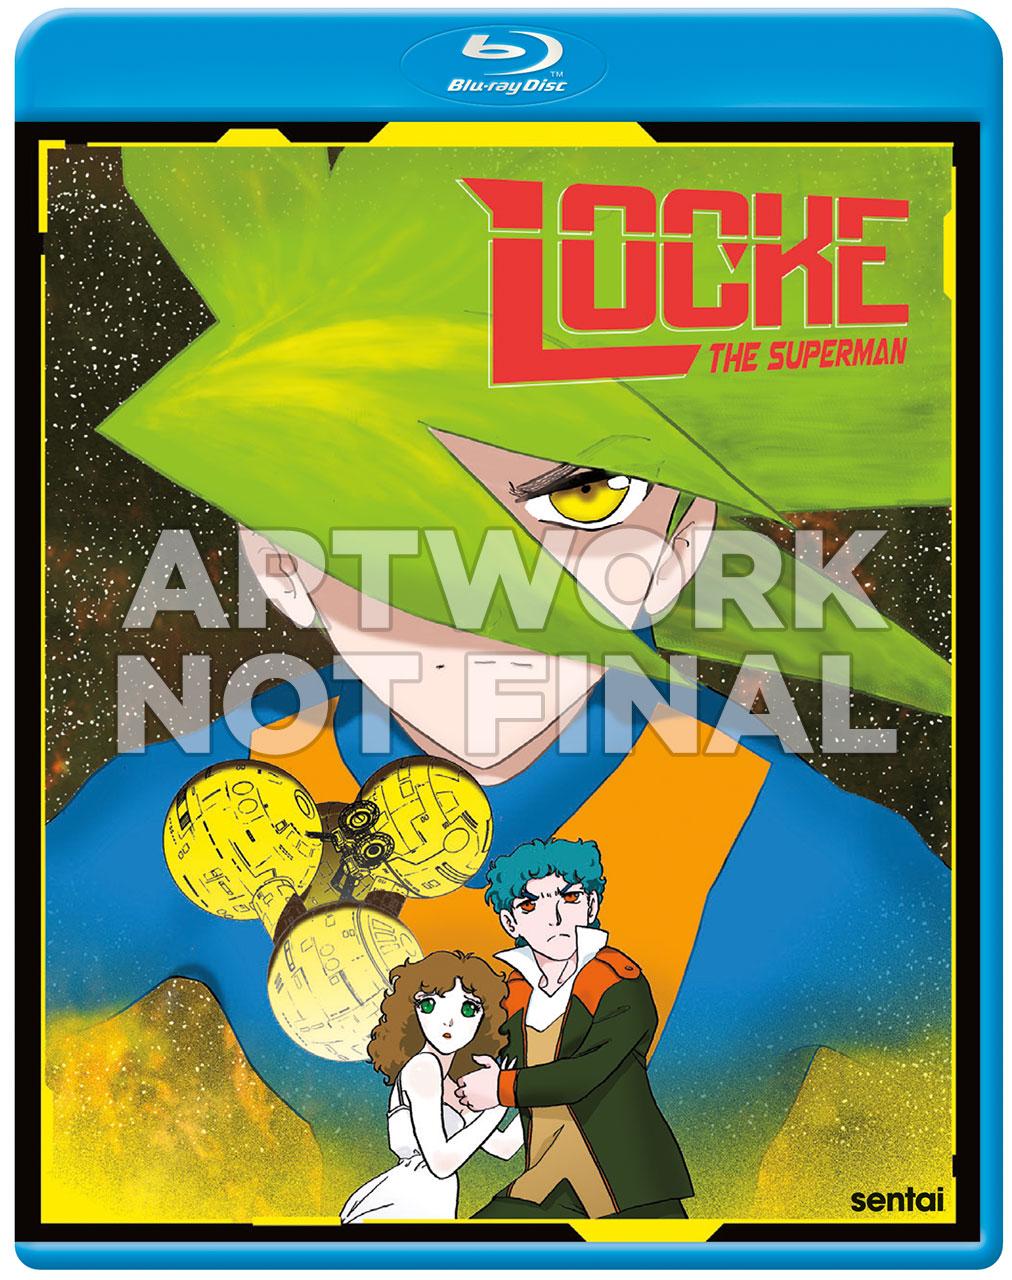 Locke the Superman Cover